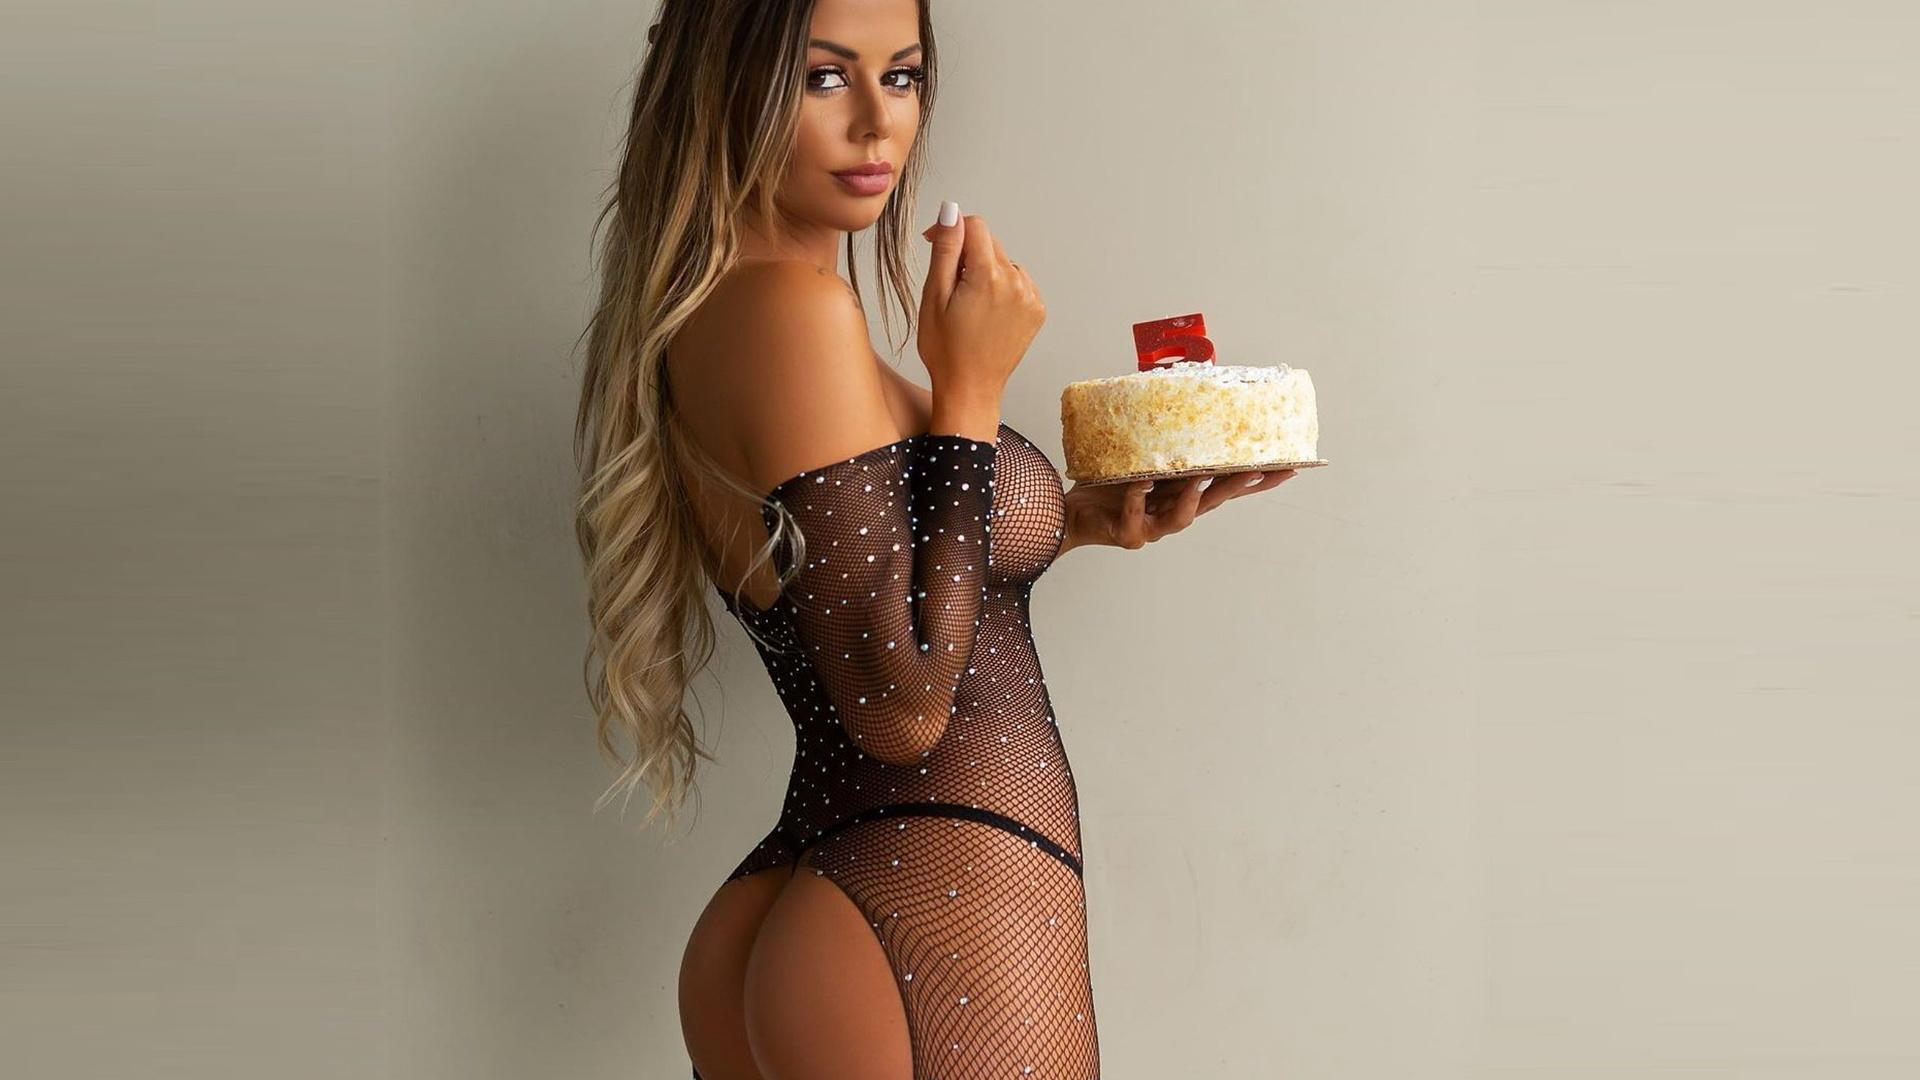 julianne kissinger, девушка, модель, торт